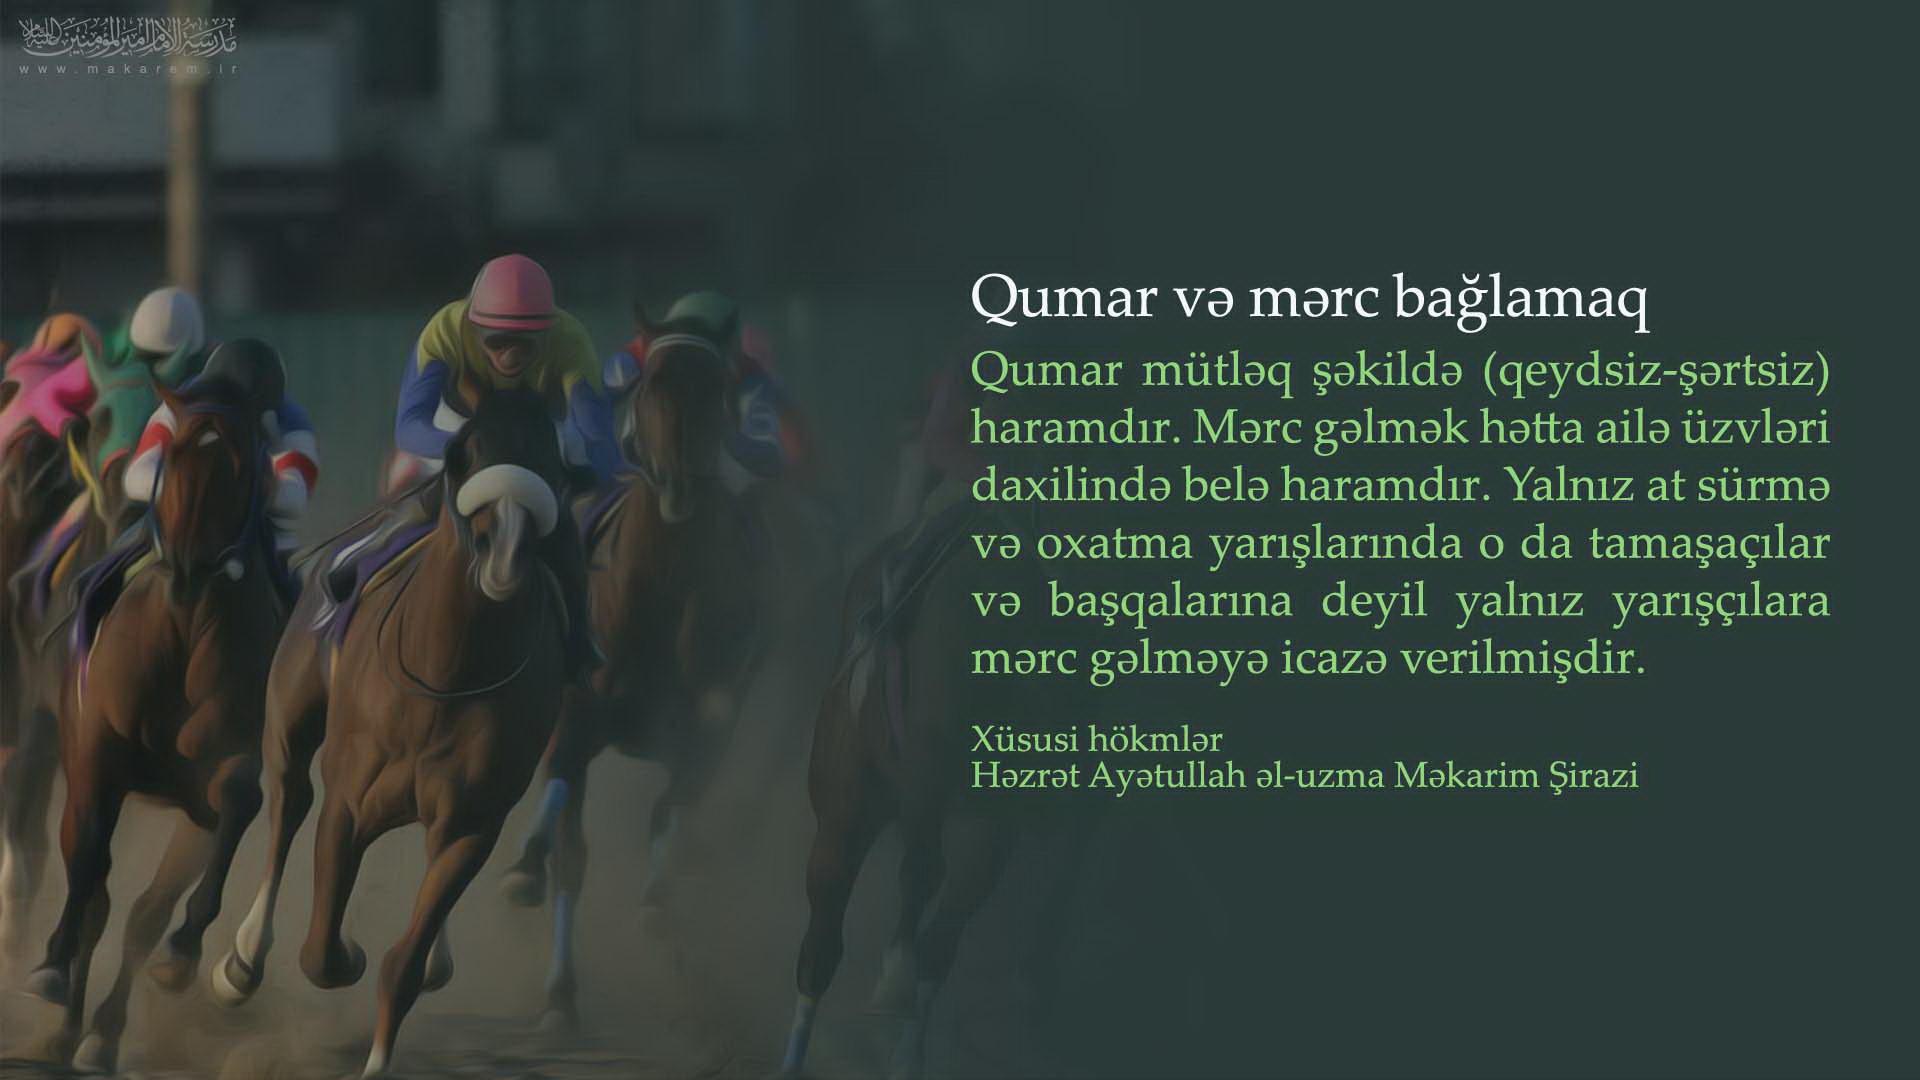 0158-مدرسه الامام امیر المومنین (ع)